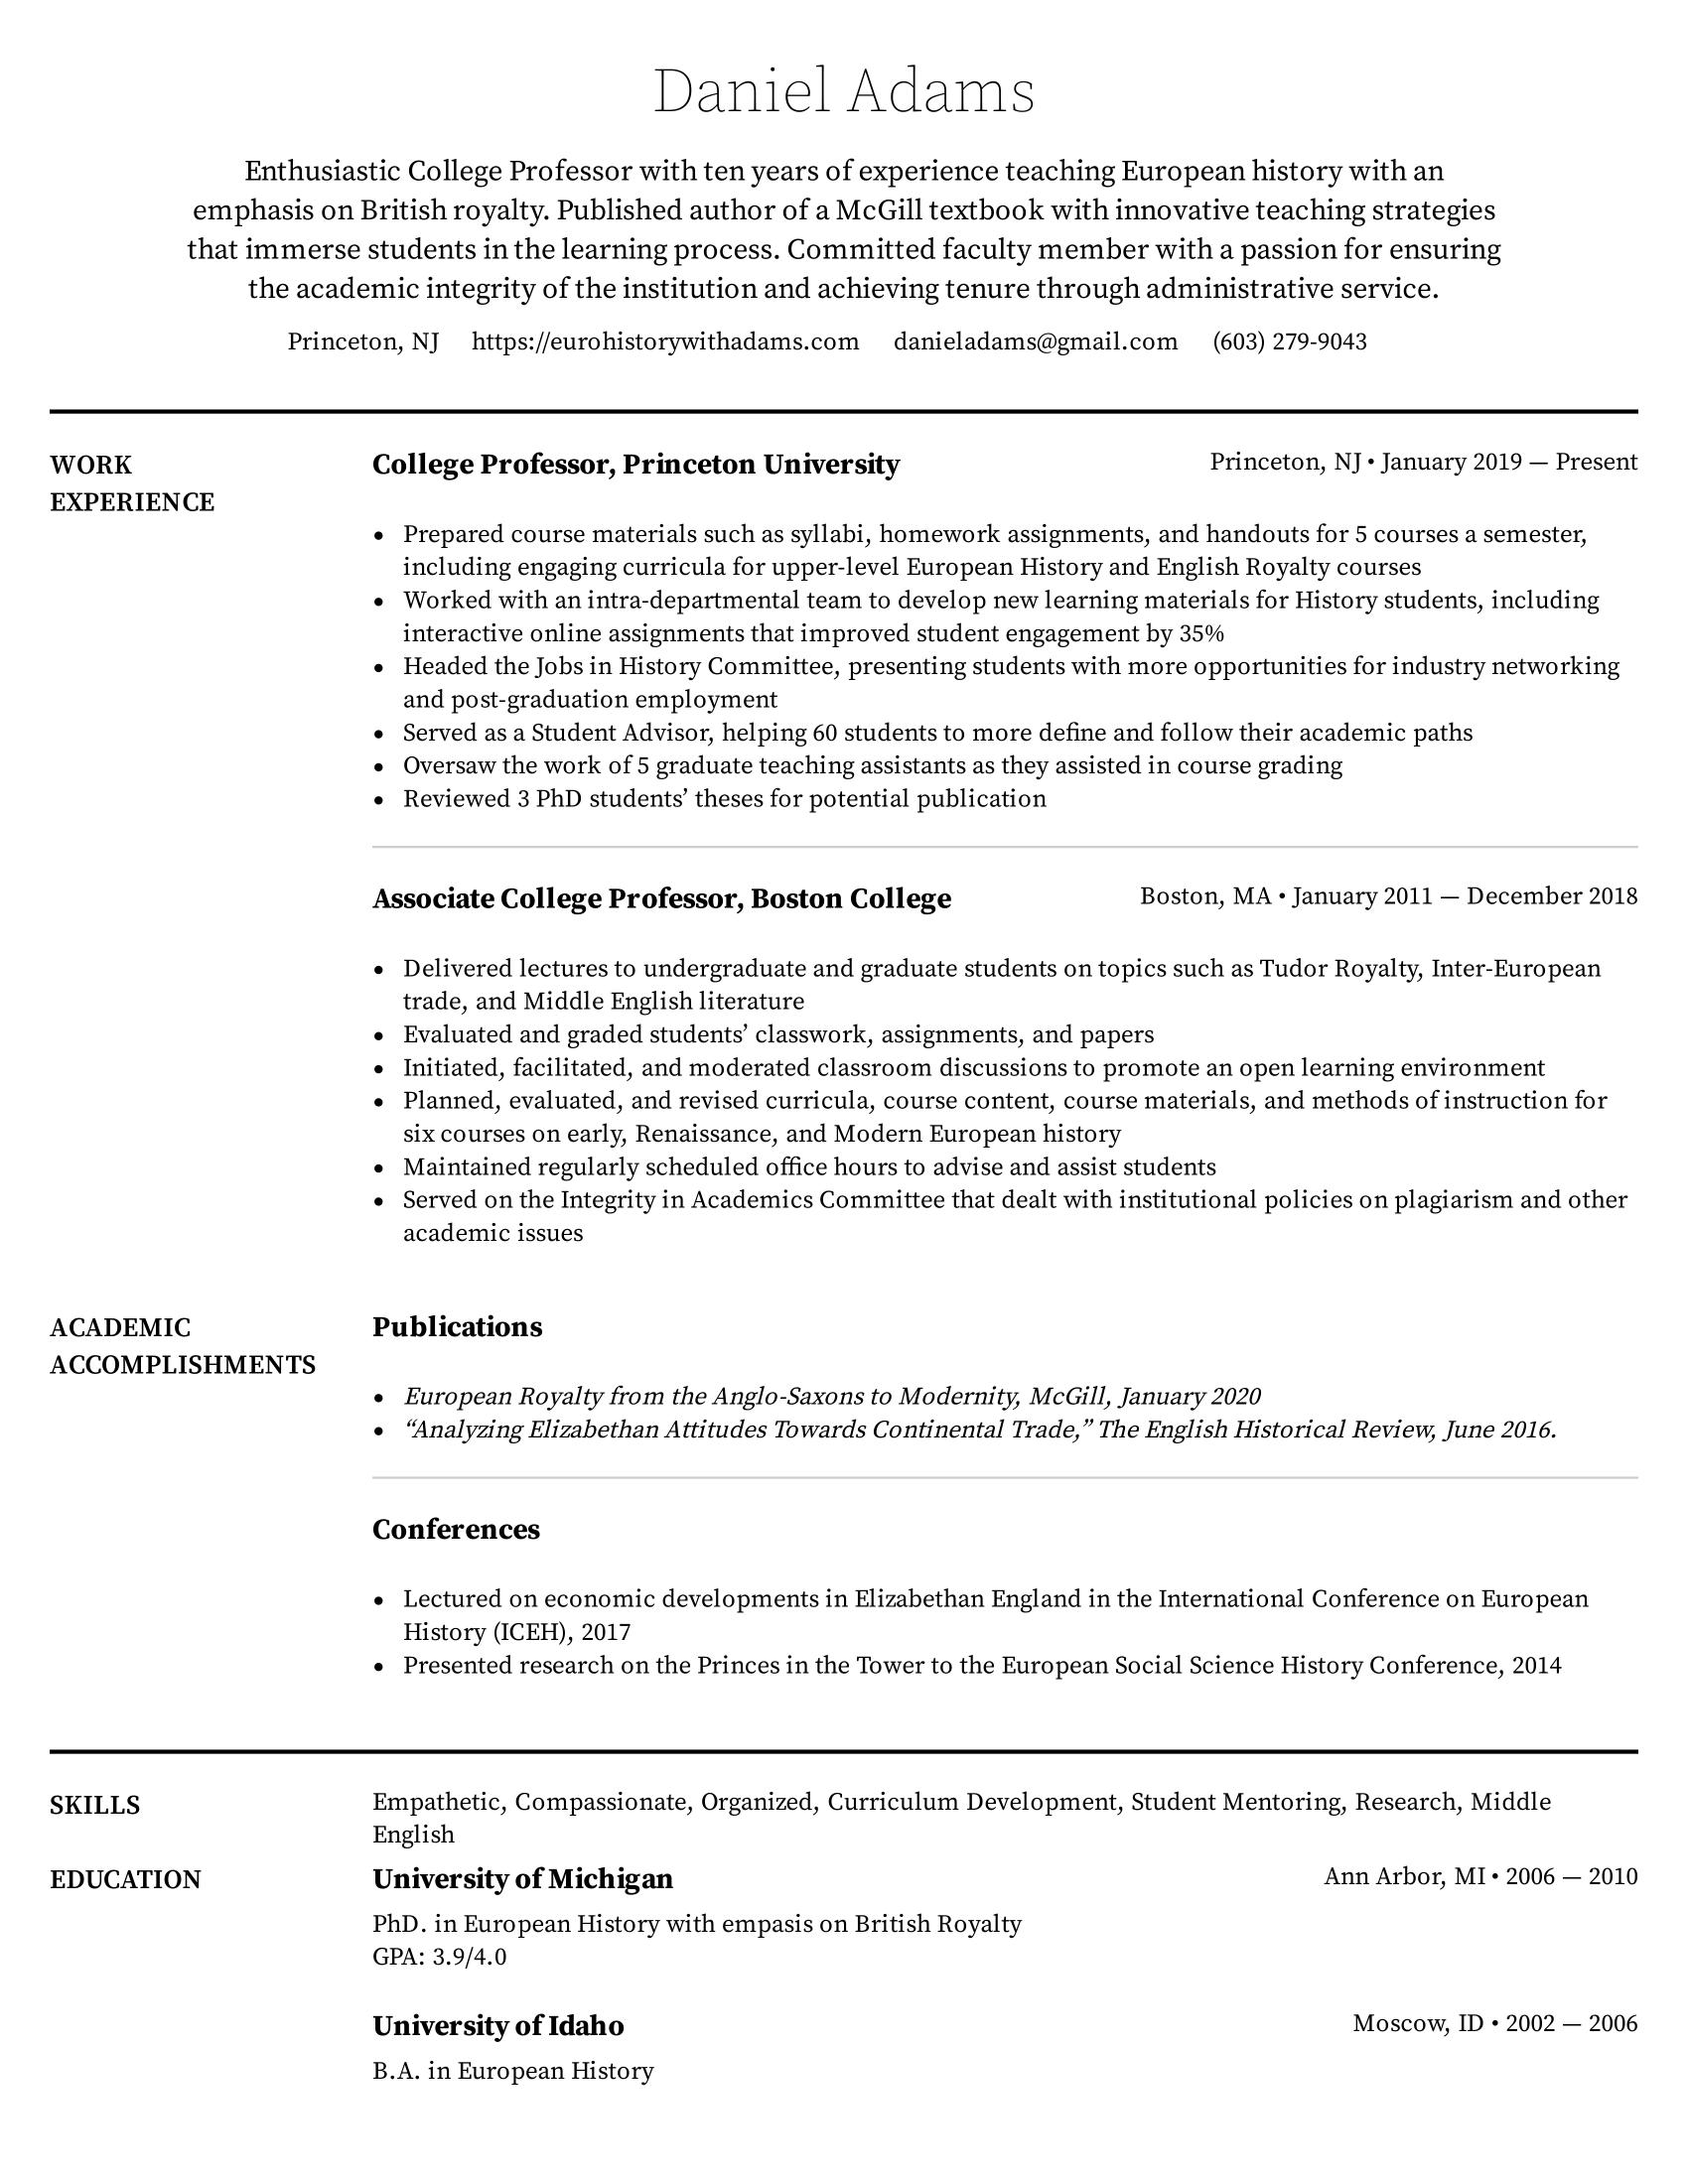 College Professor Resume Example